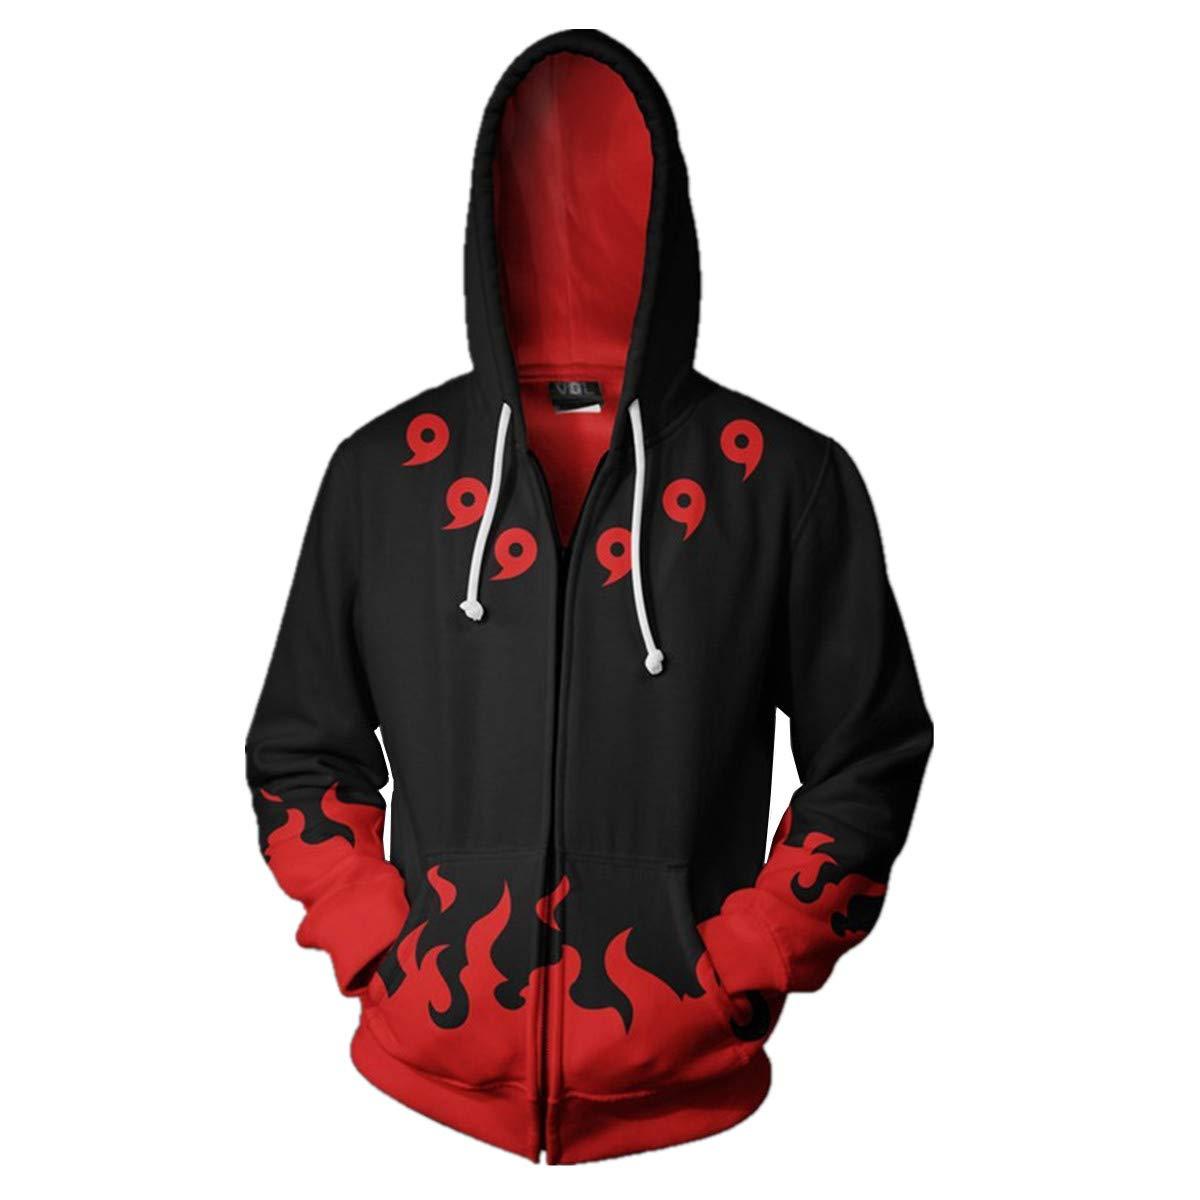 CHENMA Men Naruto Kakashi Long Sleeve Full-Zip Bomber Jacket Hooded Varsity Jacket (L/US M, Indora) by CHENMA